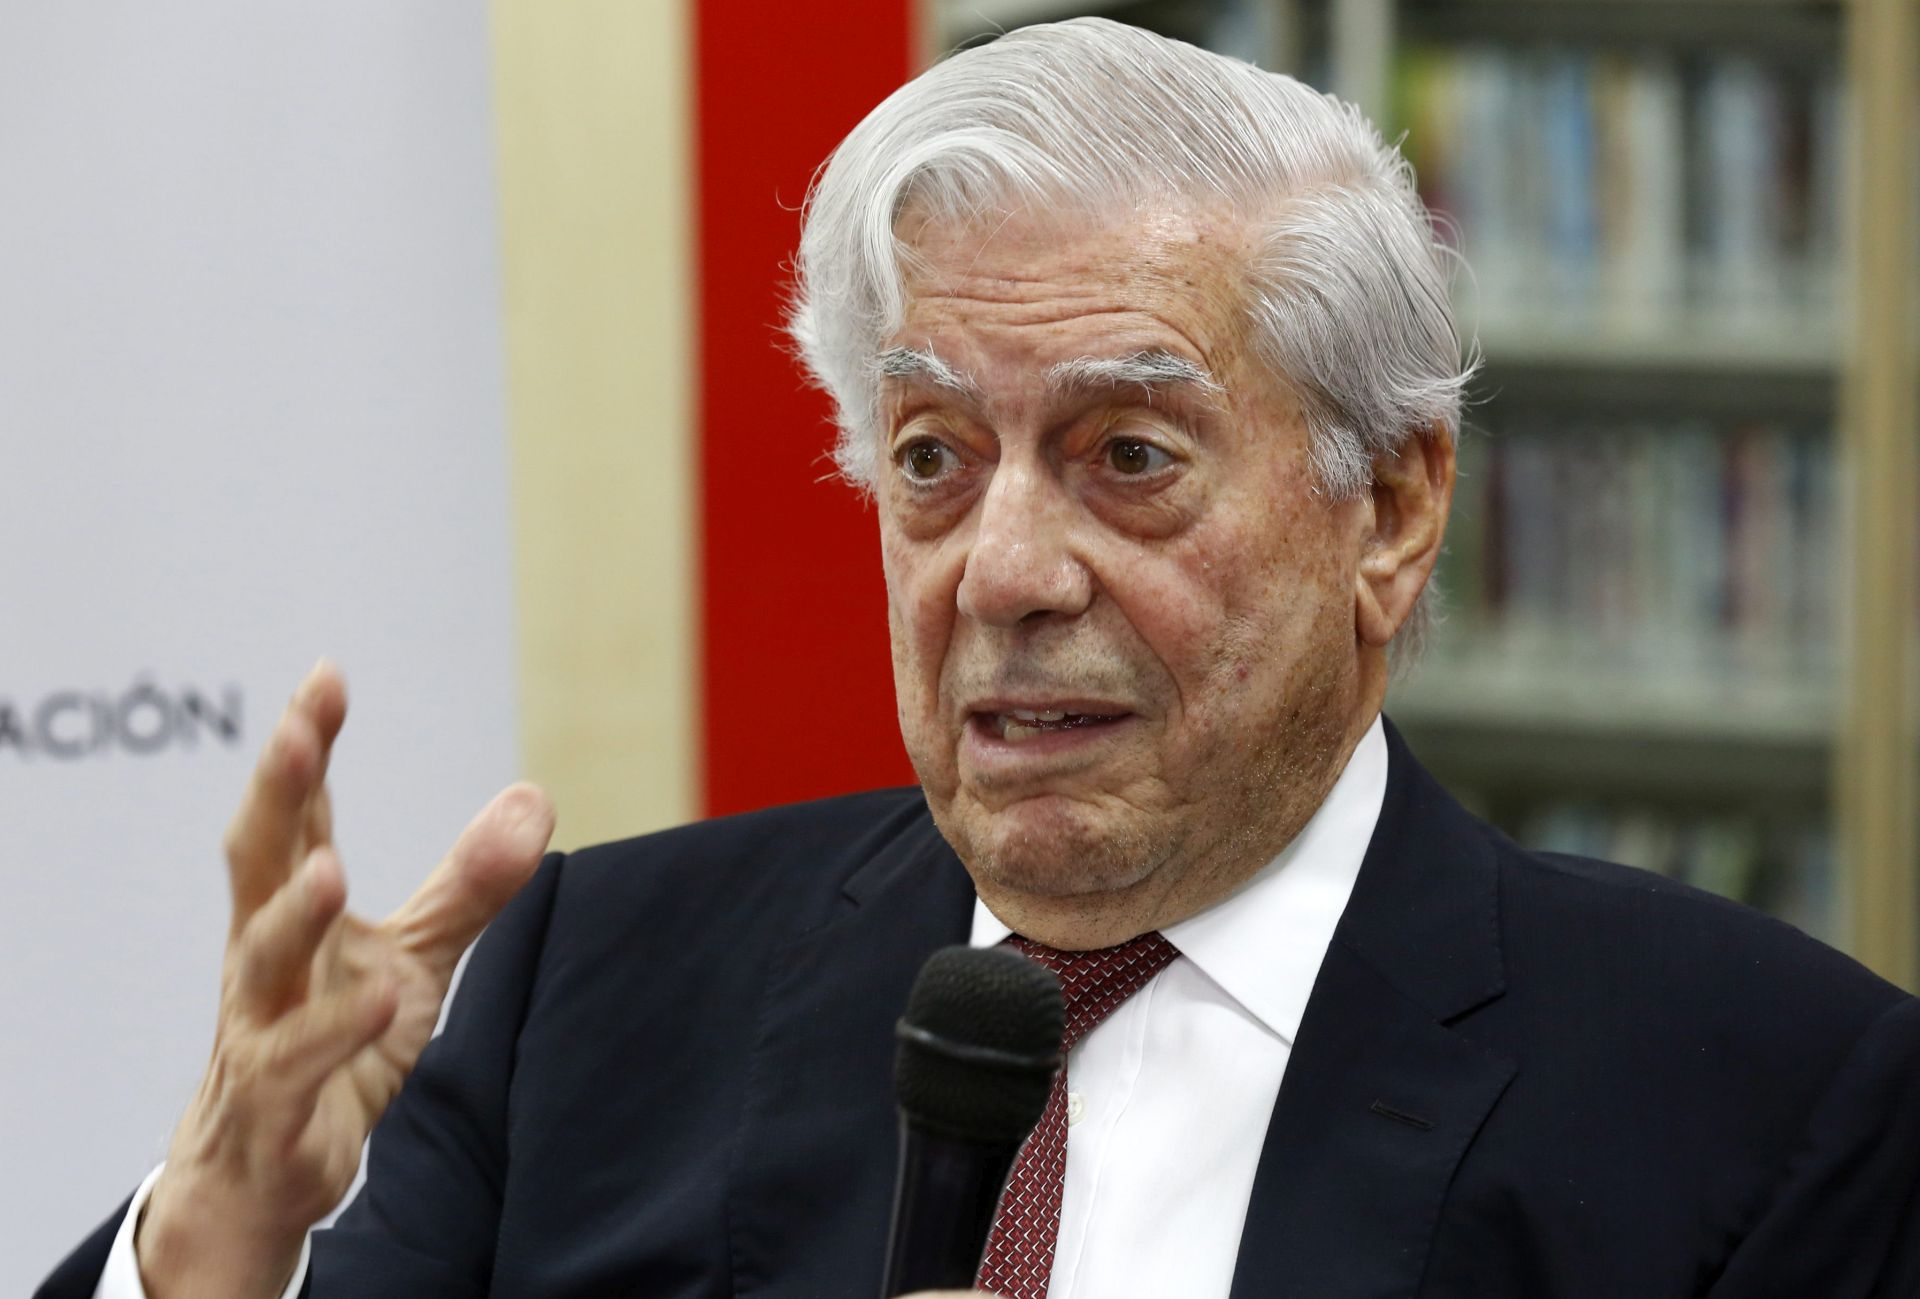 Nobelovac Vargas Llosa poziva hispanofon svijet na solidarnost nakon Trumpovih uvreda